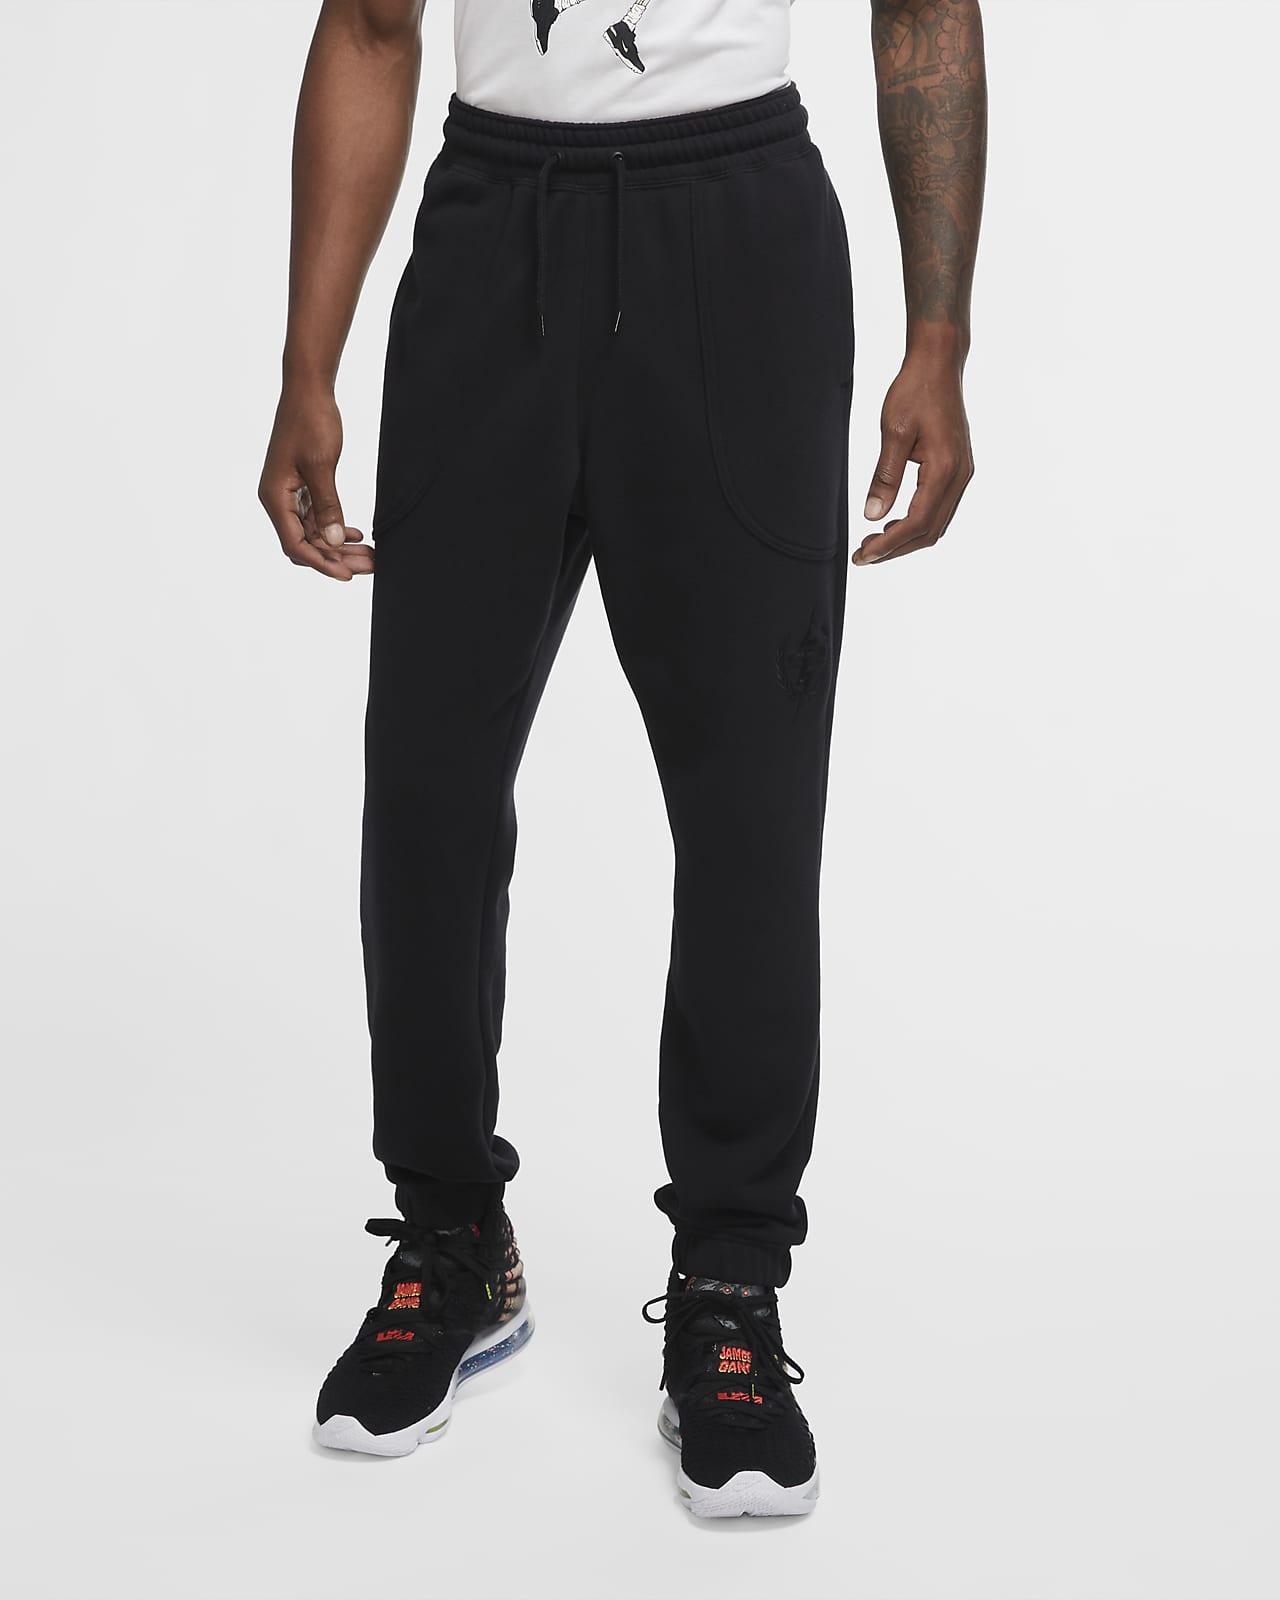 LeBron Men's Basketball Trousers